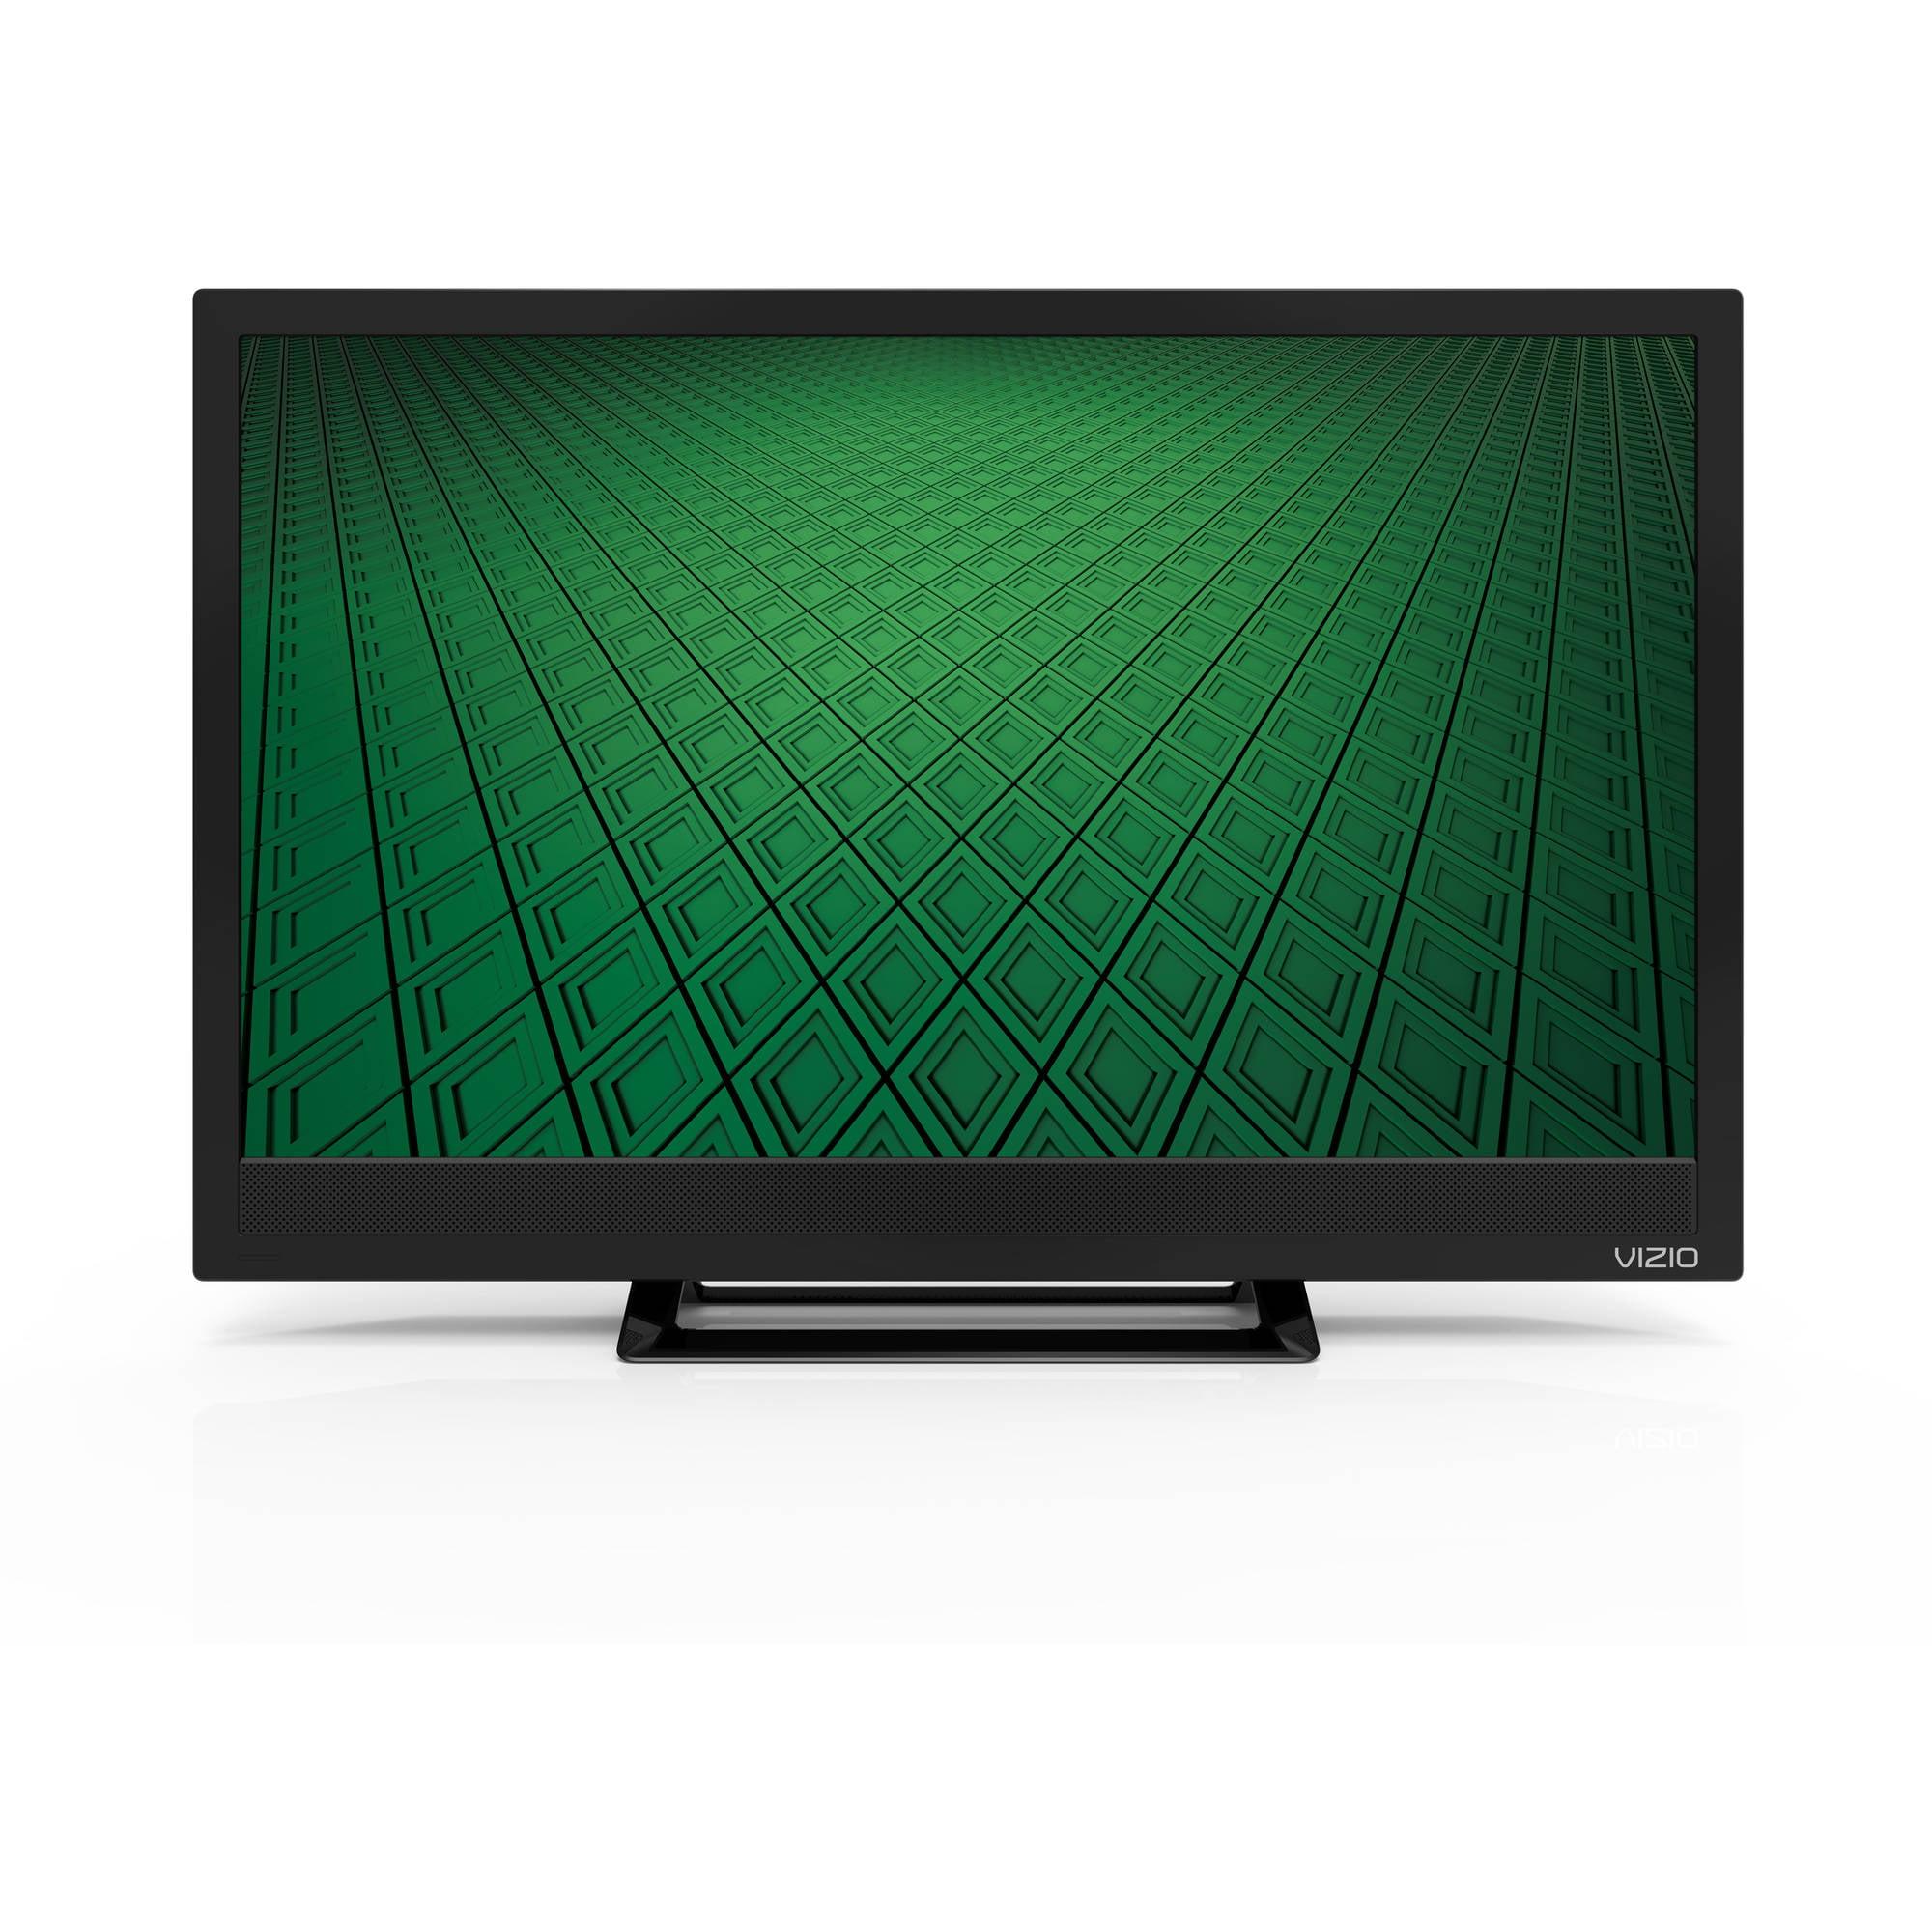 "Refurbished Vizio 24"" Class HD (720P) LED TV (D24hn-D1) by VIZIO"